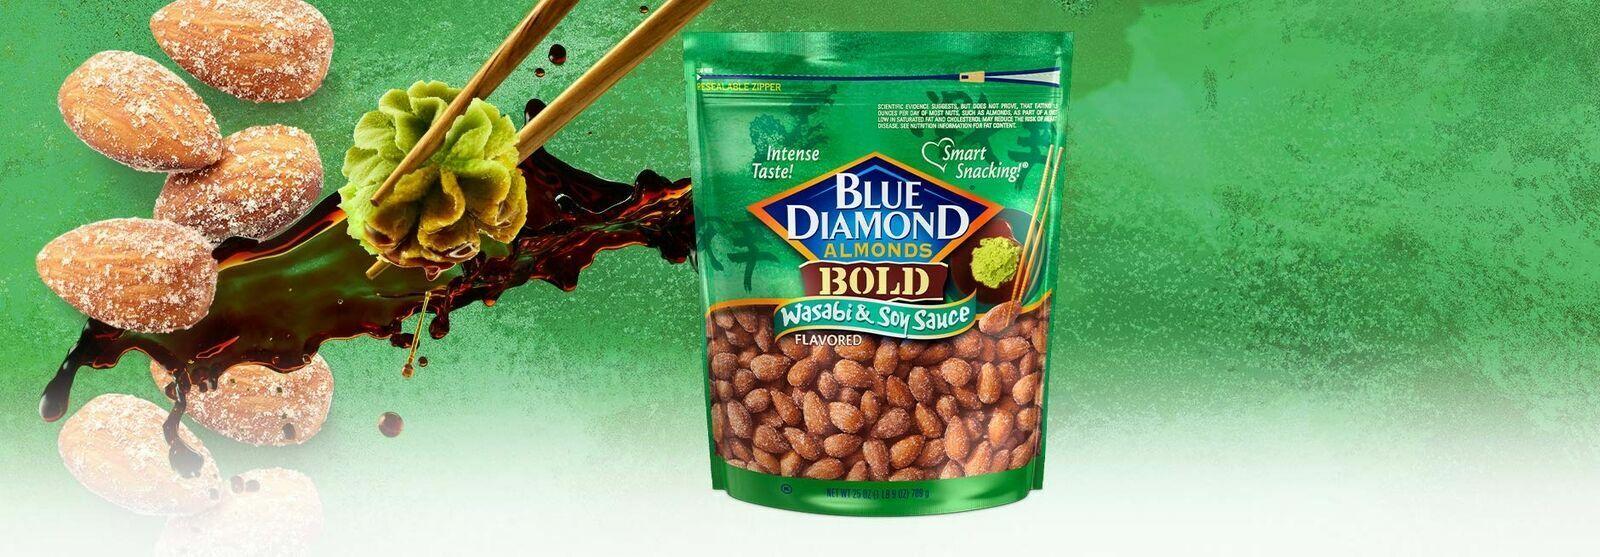 Bold Wasabi & Soy Sauce Almonds, 25 oz